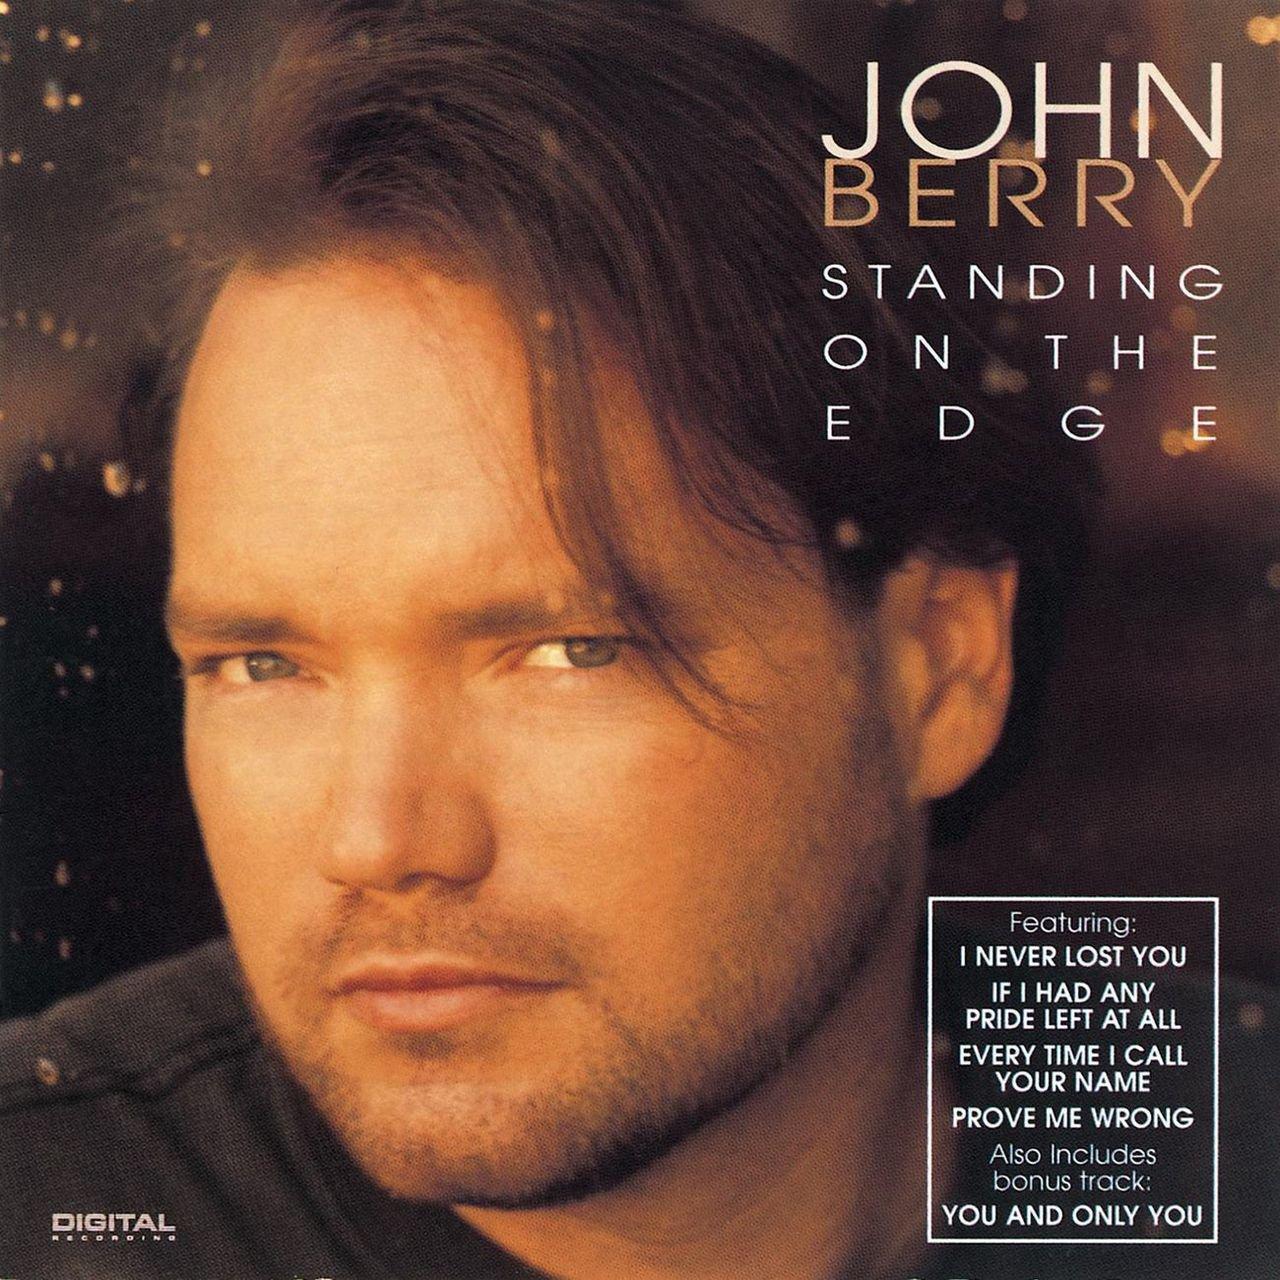 TIDAL: Listen to Standing On The Edge on TIDAL